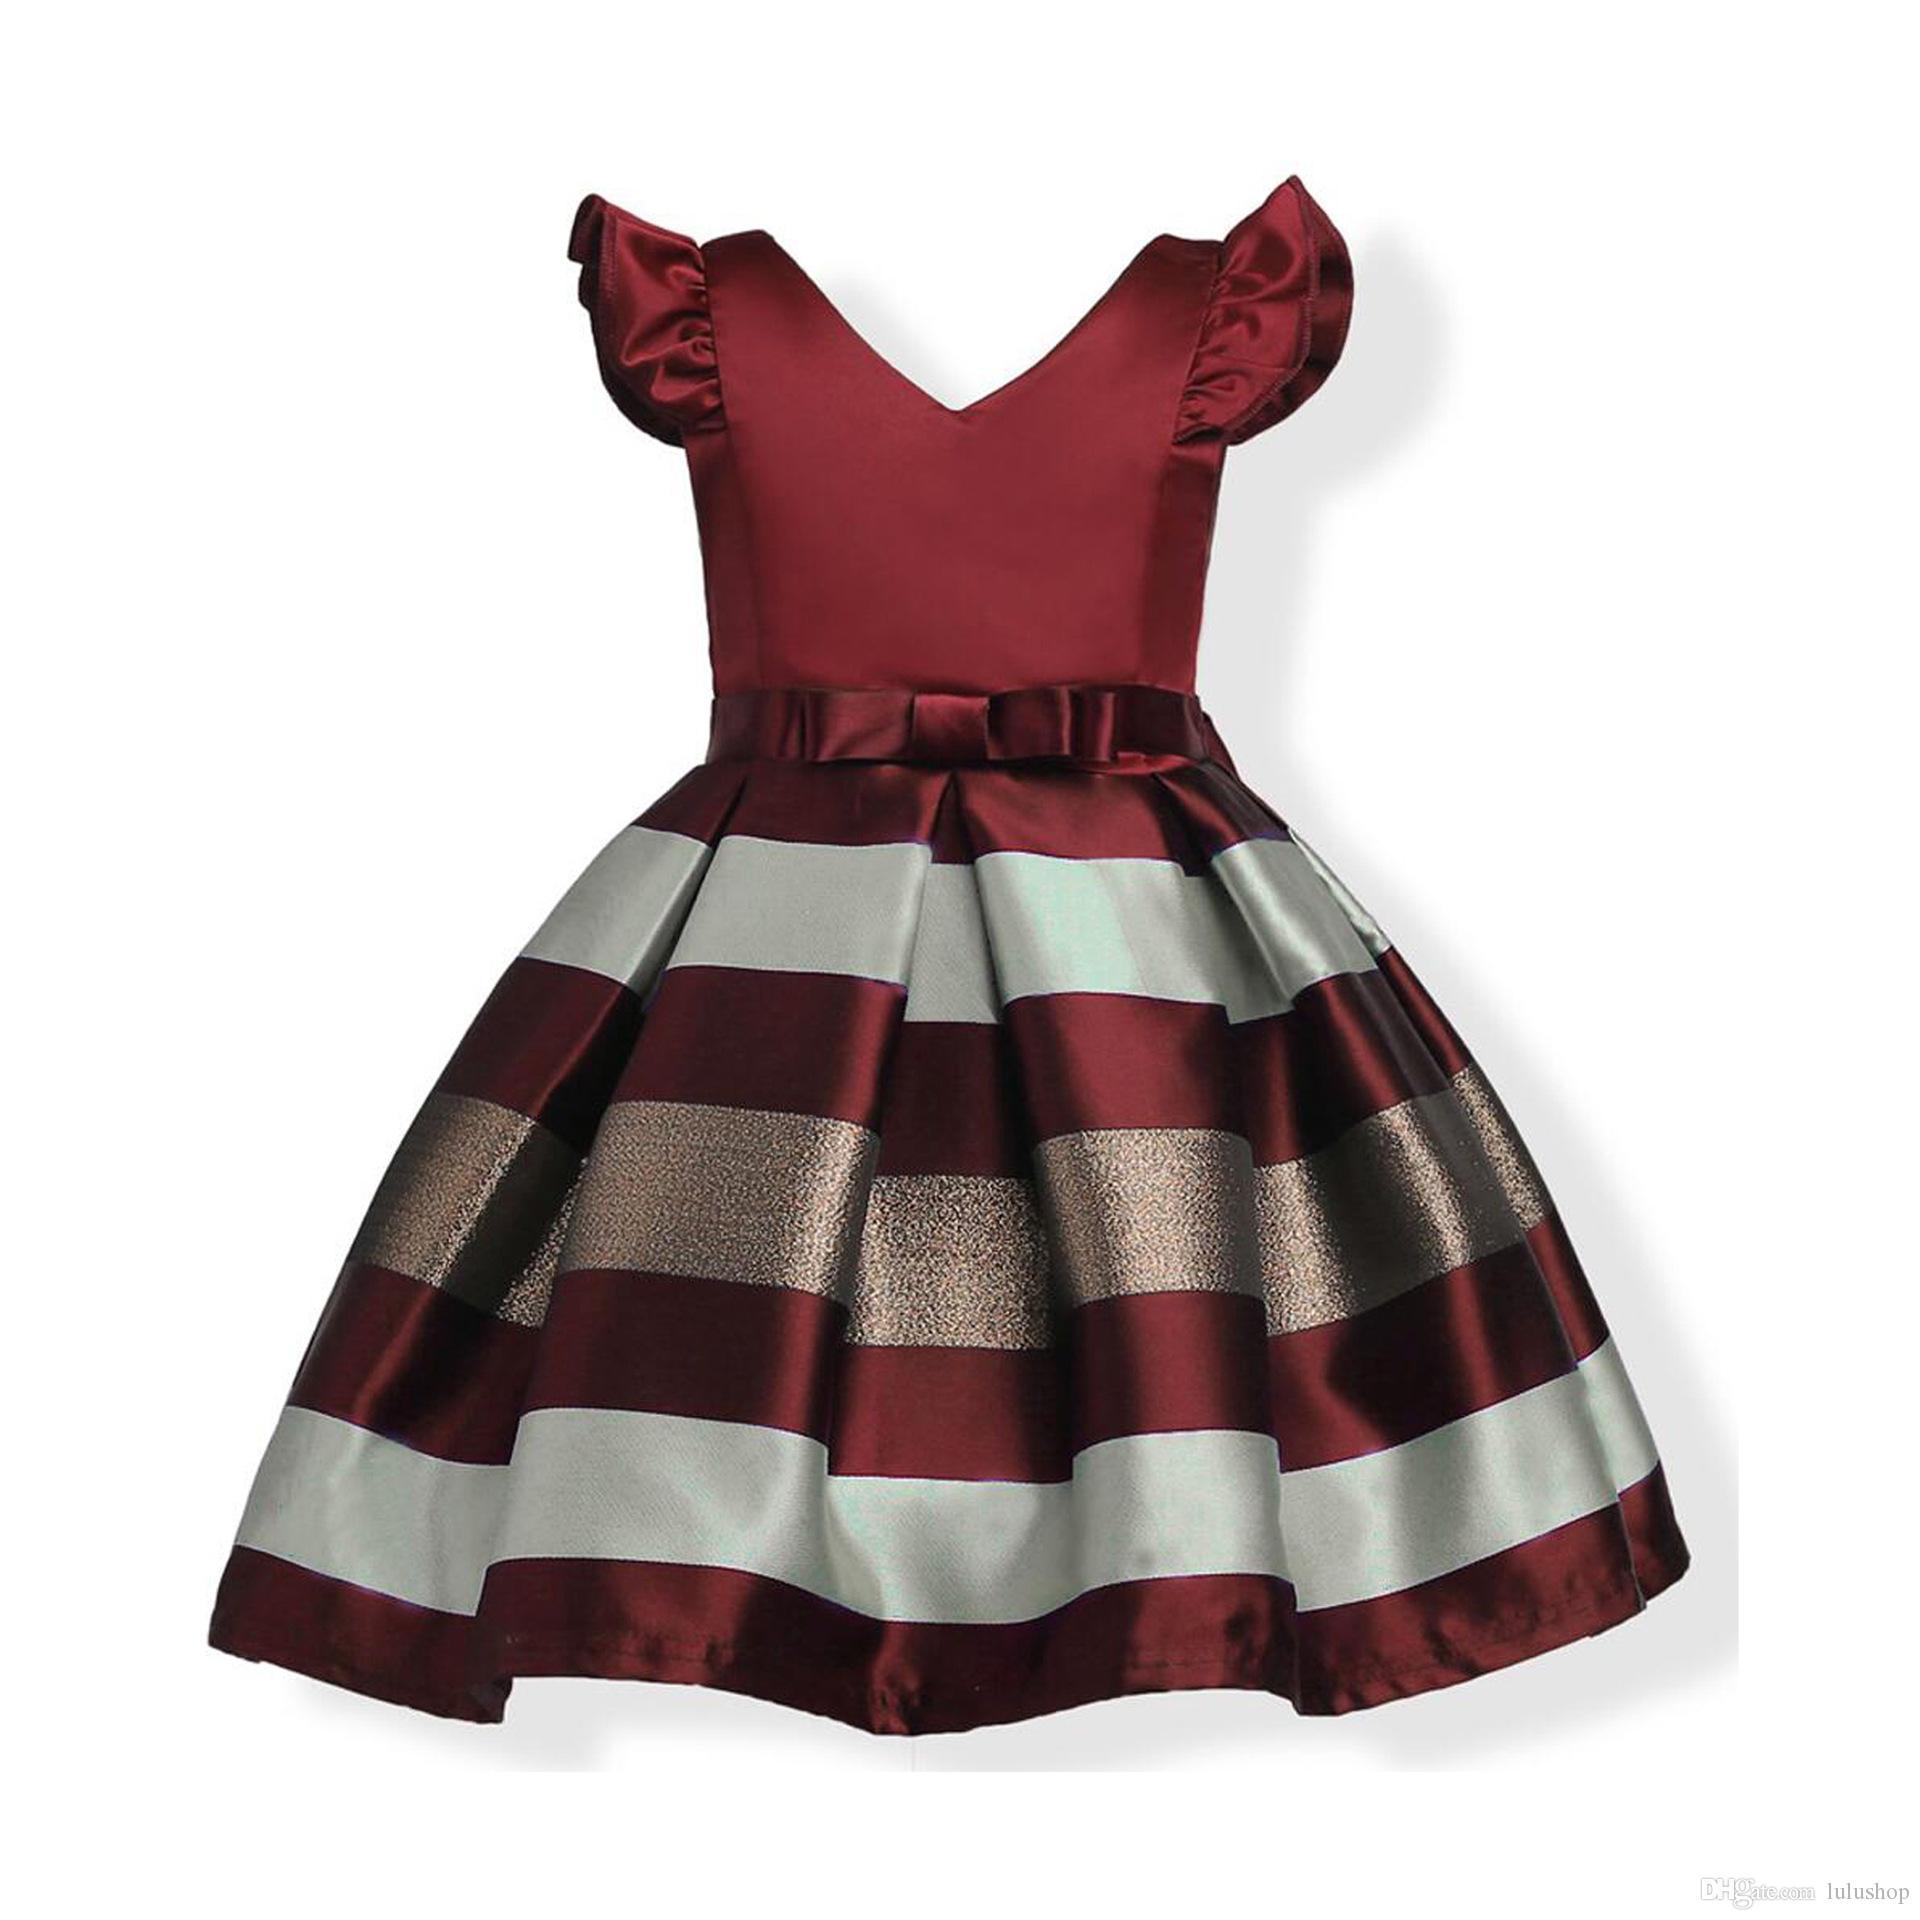 Baby Girls Striped Dress For Girls Formal Wedding Party Dresses Kids Princess Christmas Dress up costume Children Girls Clothing